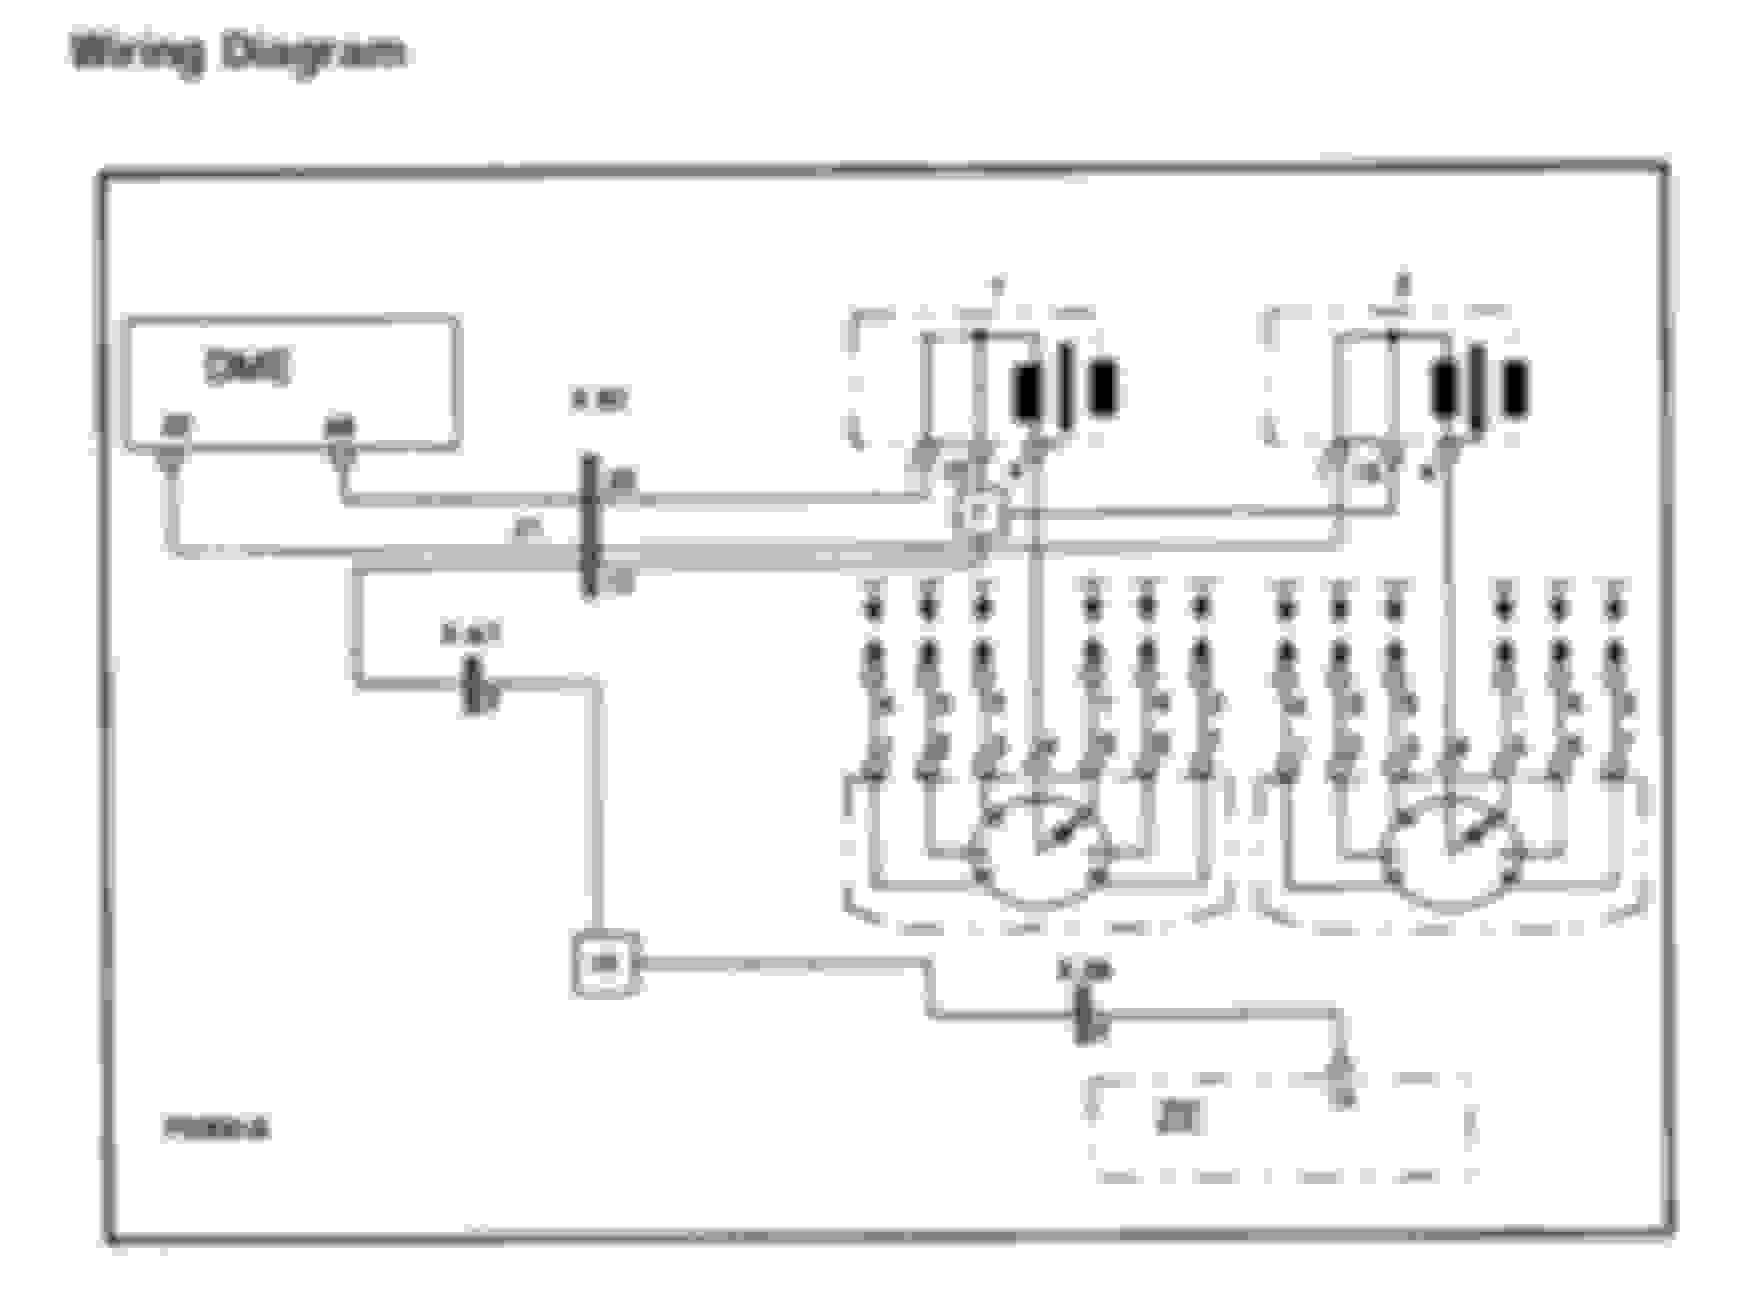 DIY - Changing Spark Plug Wires - Rennlist - Porsche ... Pico Wiring Diagram Of A Ups System on